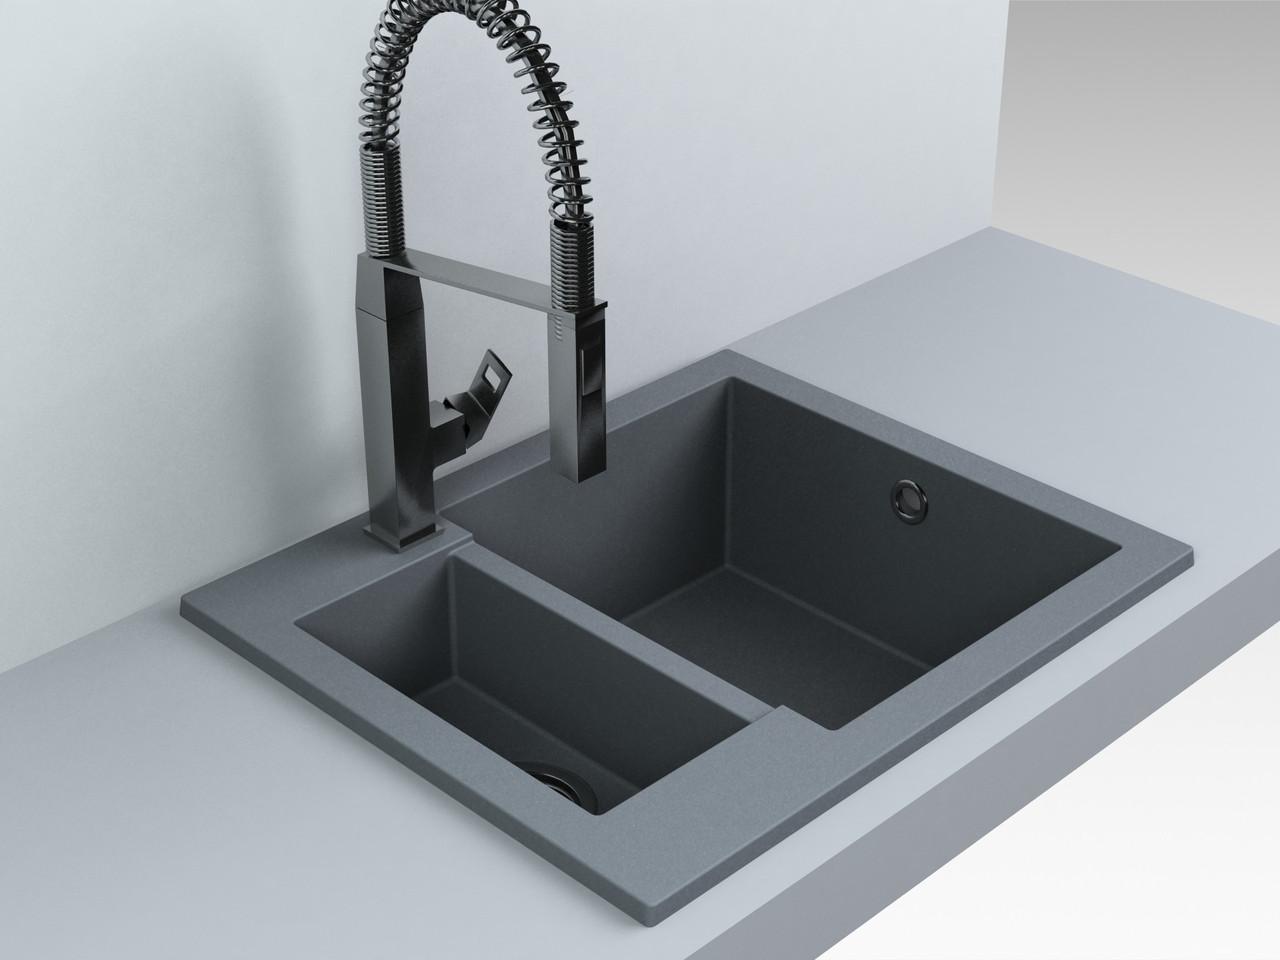 Кухонная мойка Fancy Marble Arizona (1,5 чаши),105067013 , gray